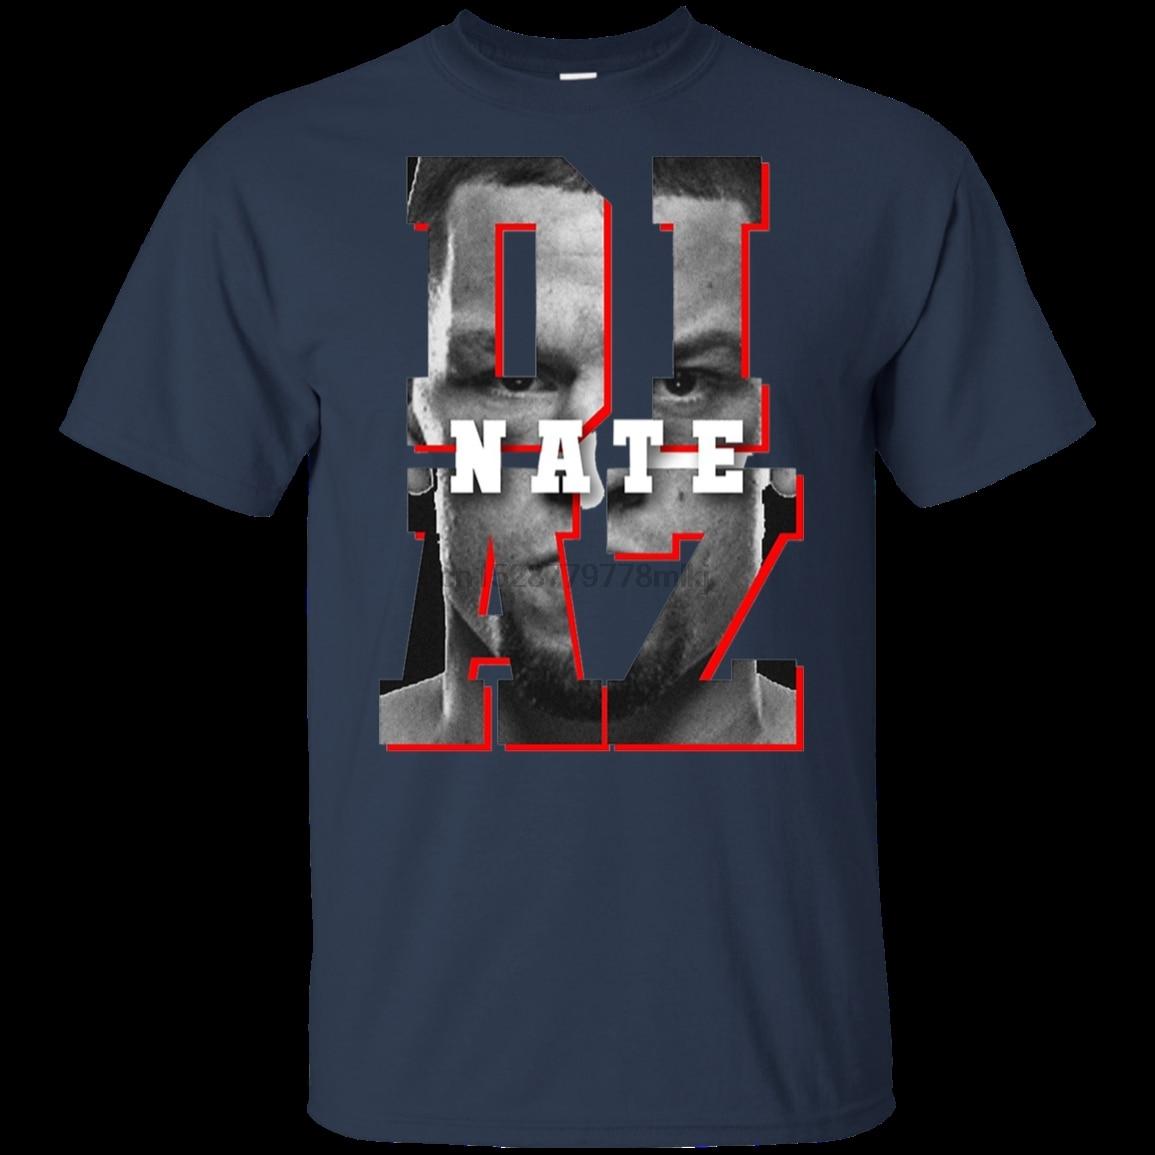 Nate Diaz camiseta Nate Diaz tri-blend USA camiseta azul marino para hombres-mujeres camiseta grande con cuello redondo camisas estilos